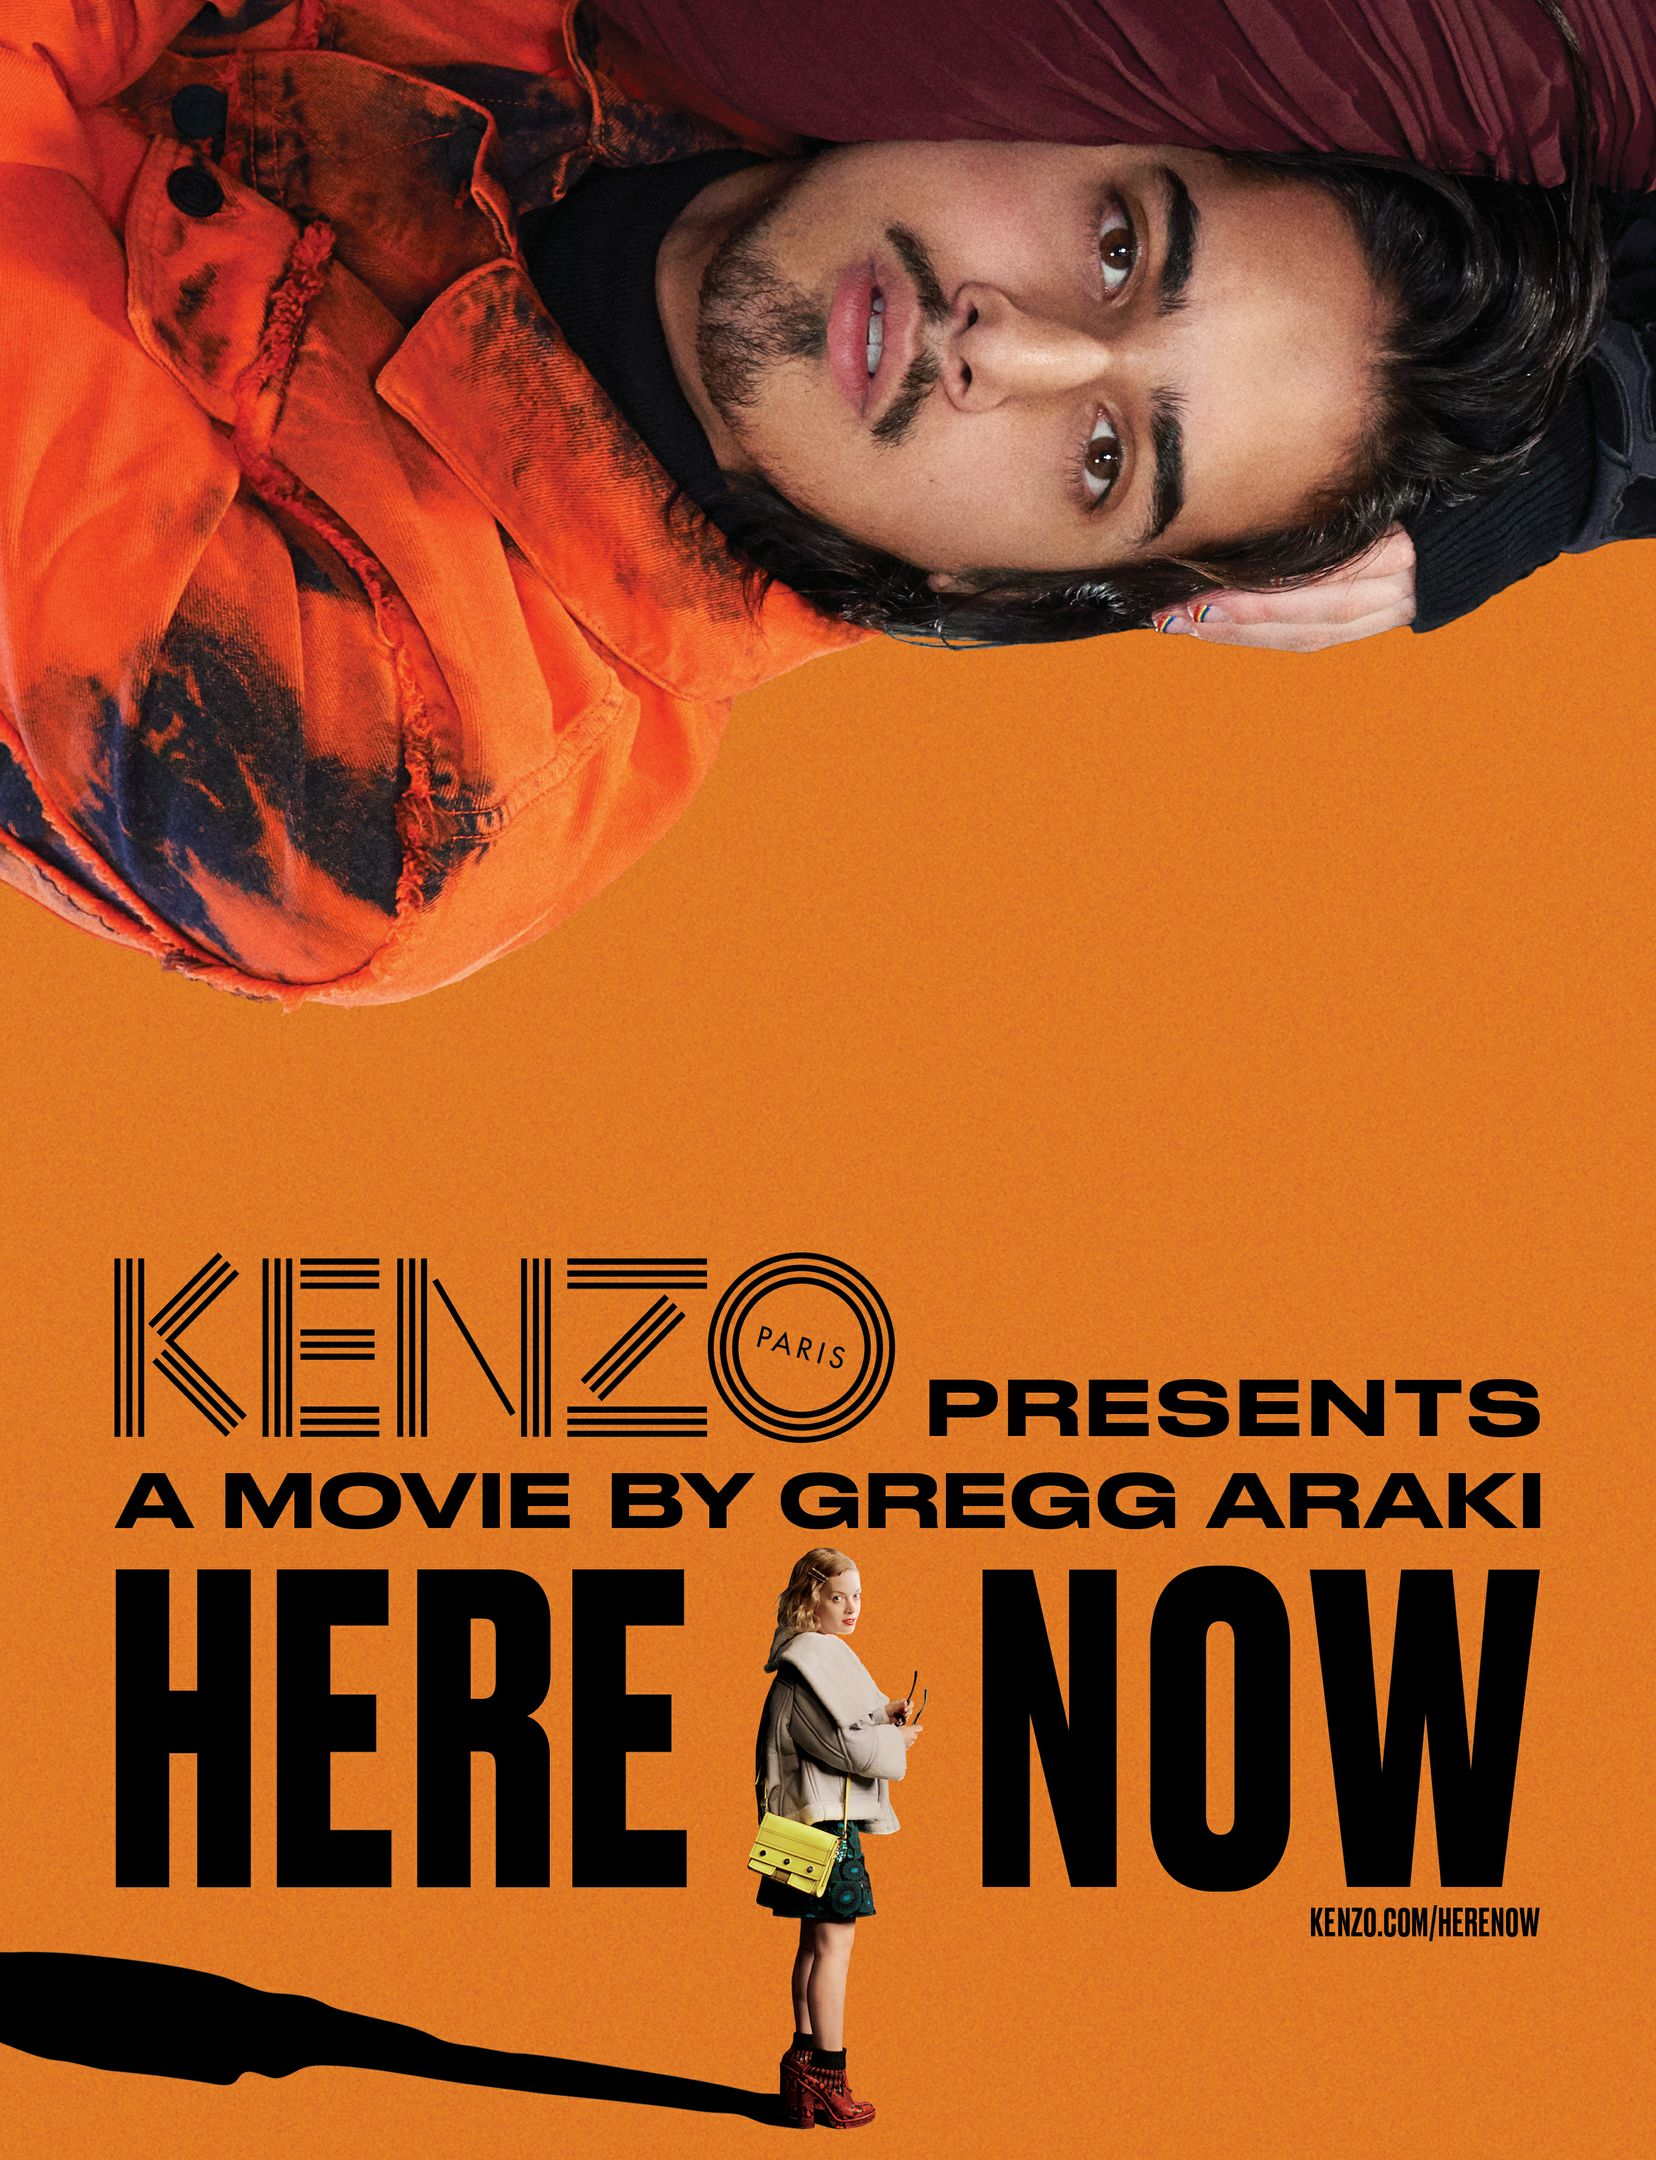 "KENZO Presents ""Here Now"" Movie By Gregg Araki"